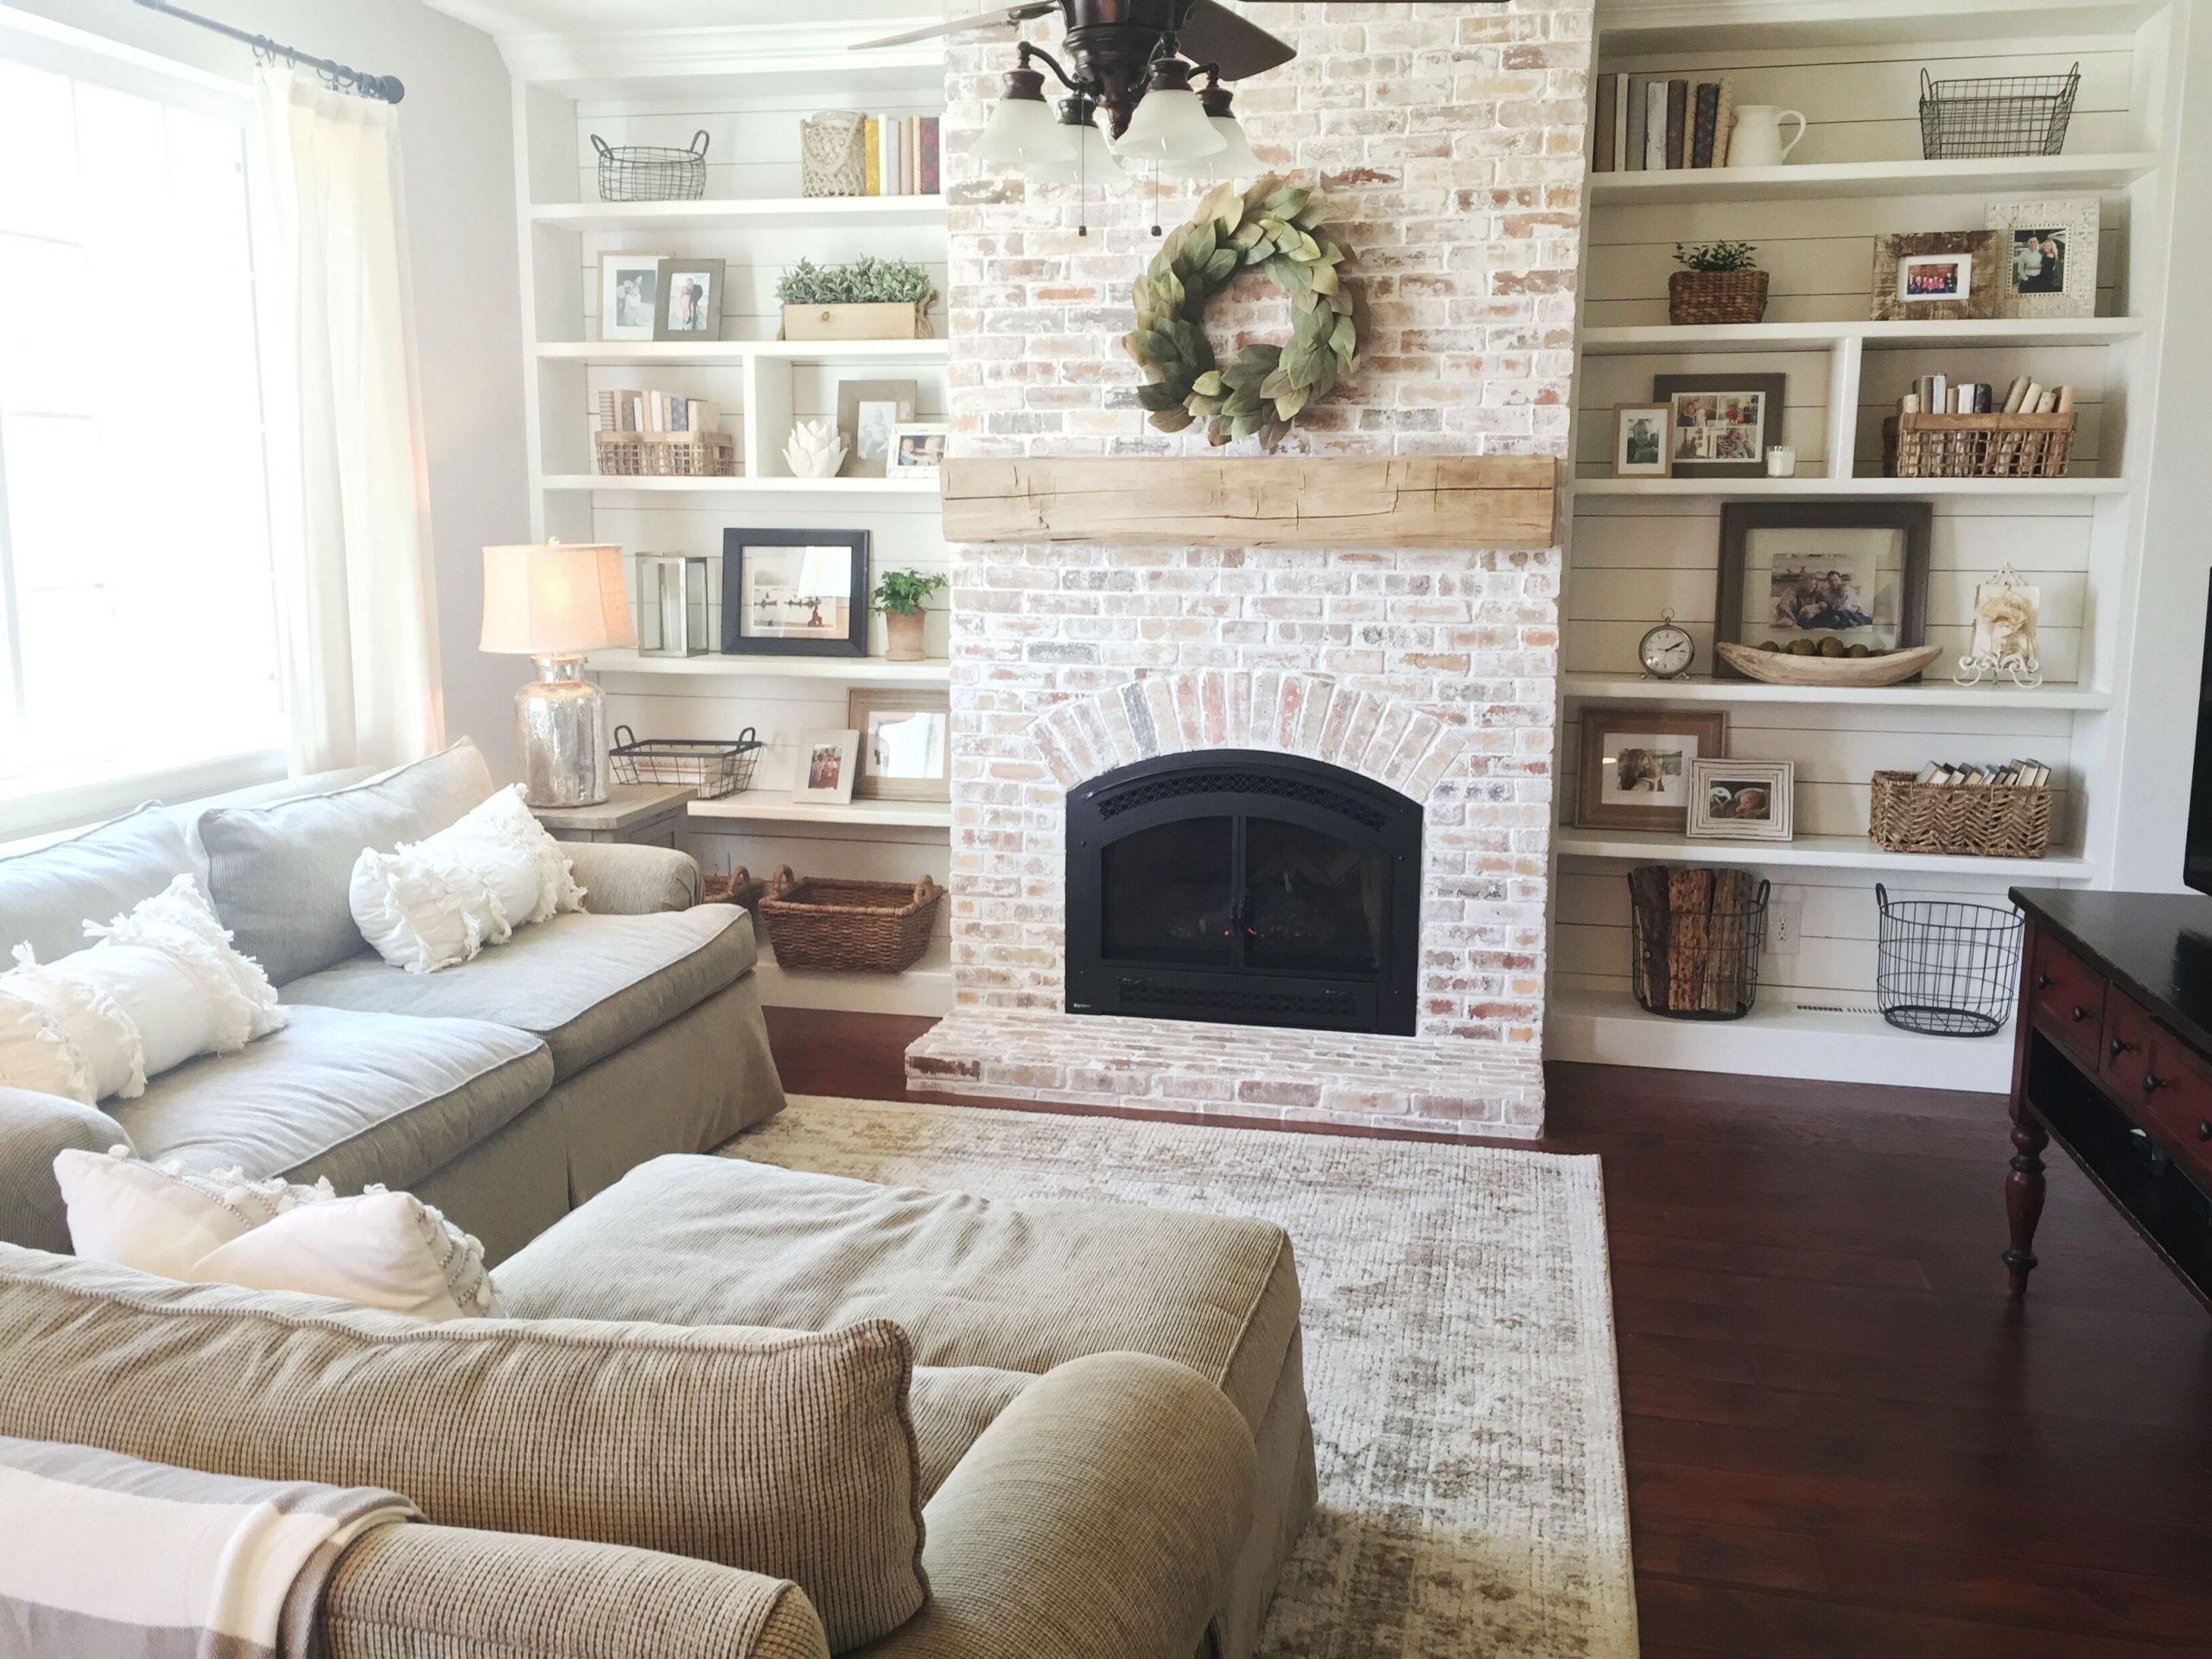 Rustic Shiplap Fireplace Lovely Built Ins Shiplap Whitewash Brick Fireplace Bookshelf